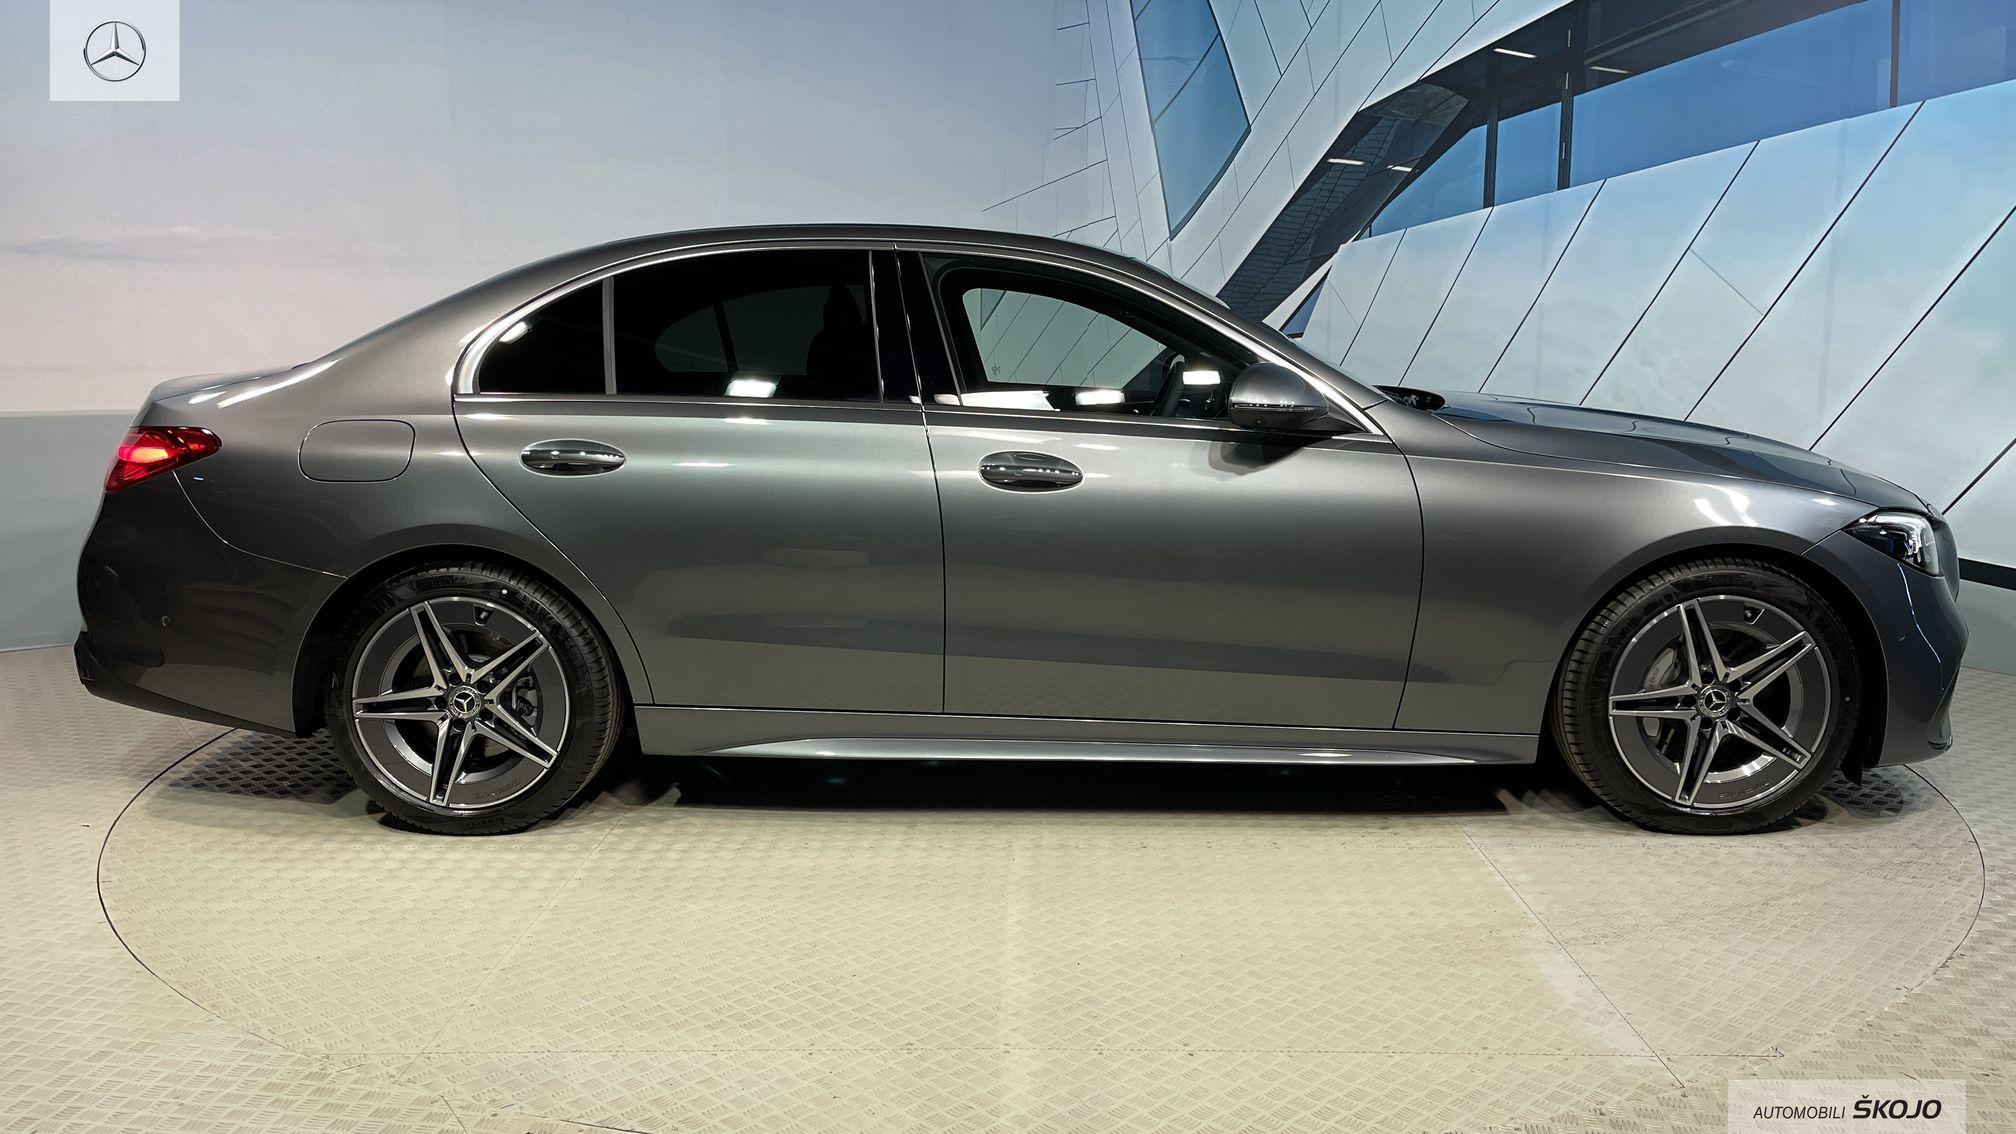 Mercedes-Benz_Škojo_3